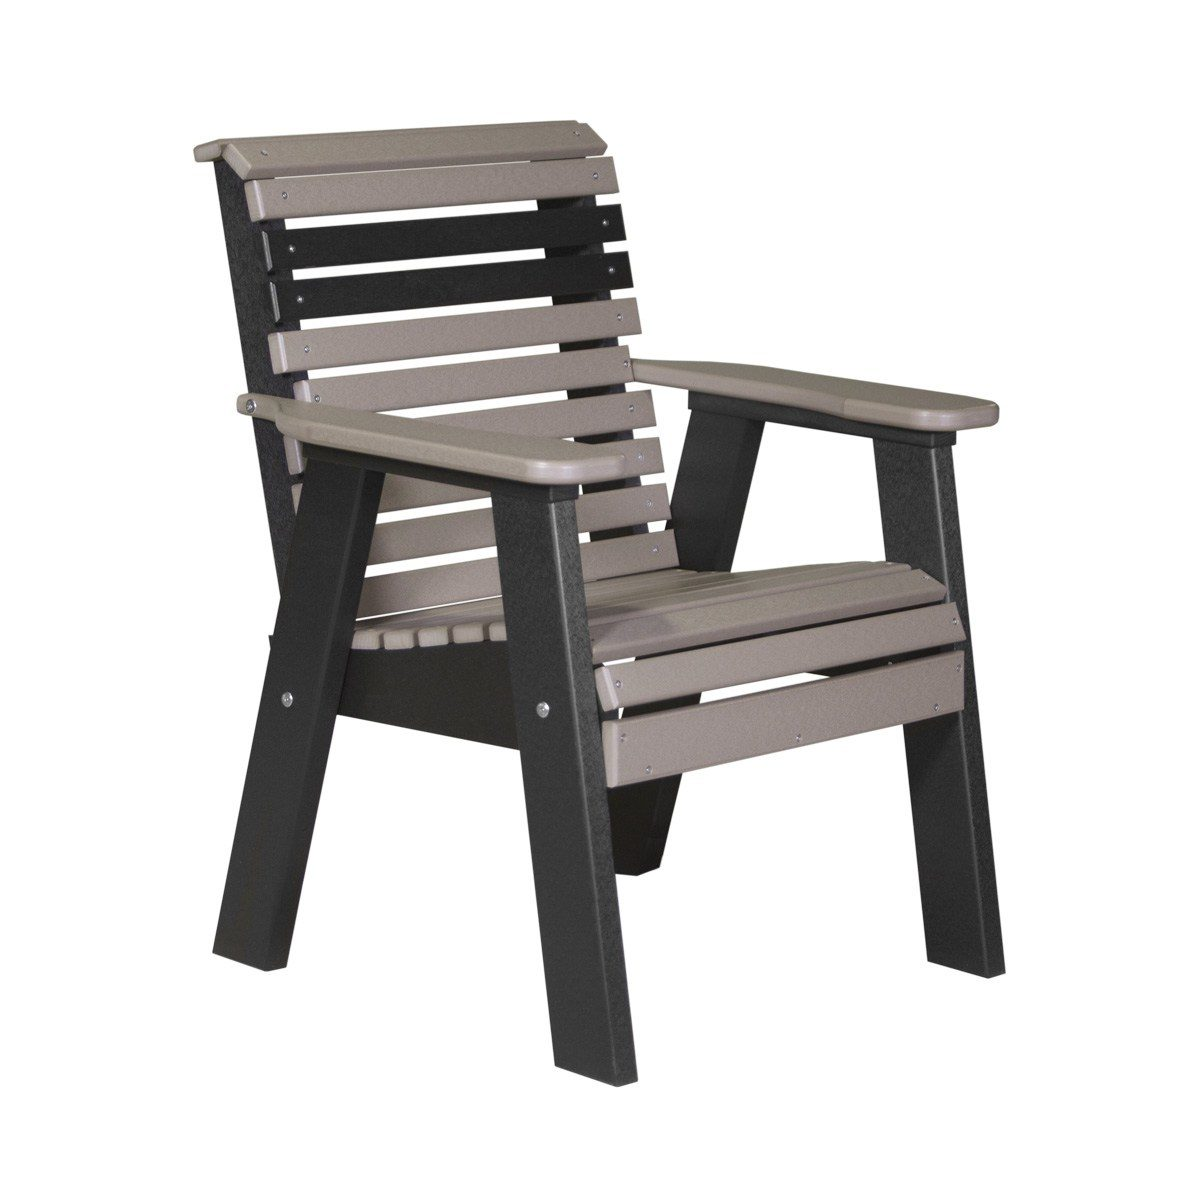 Single Plain Bench - Weatherwood & Black